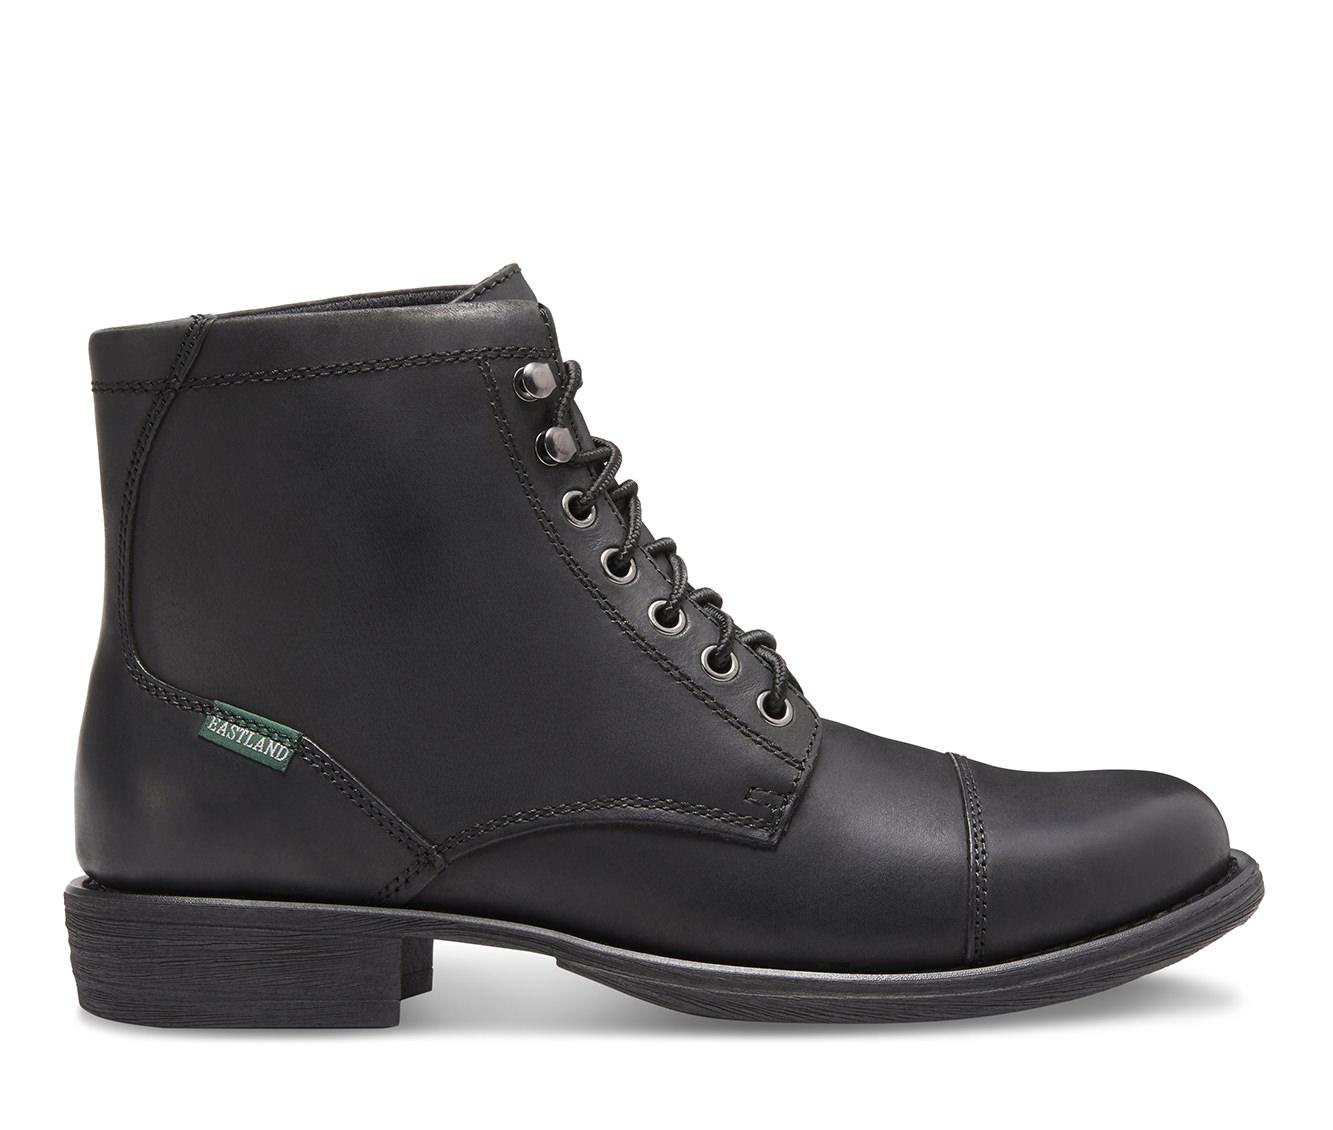 Eastland High Fidelity Men's Boots (Black Leather)